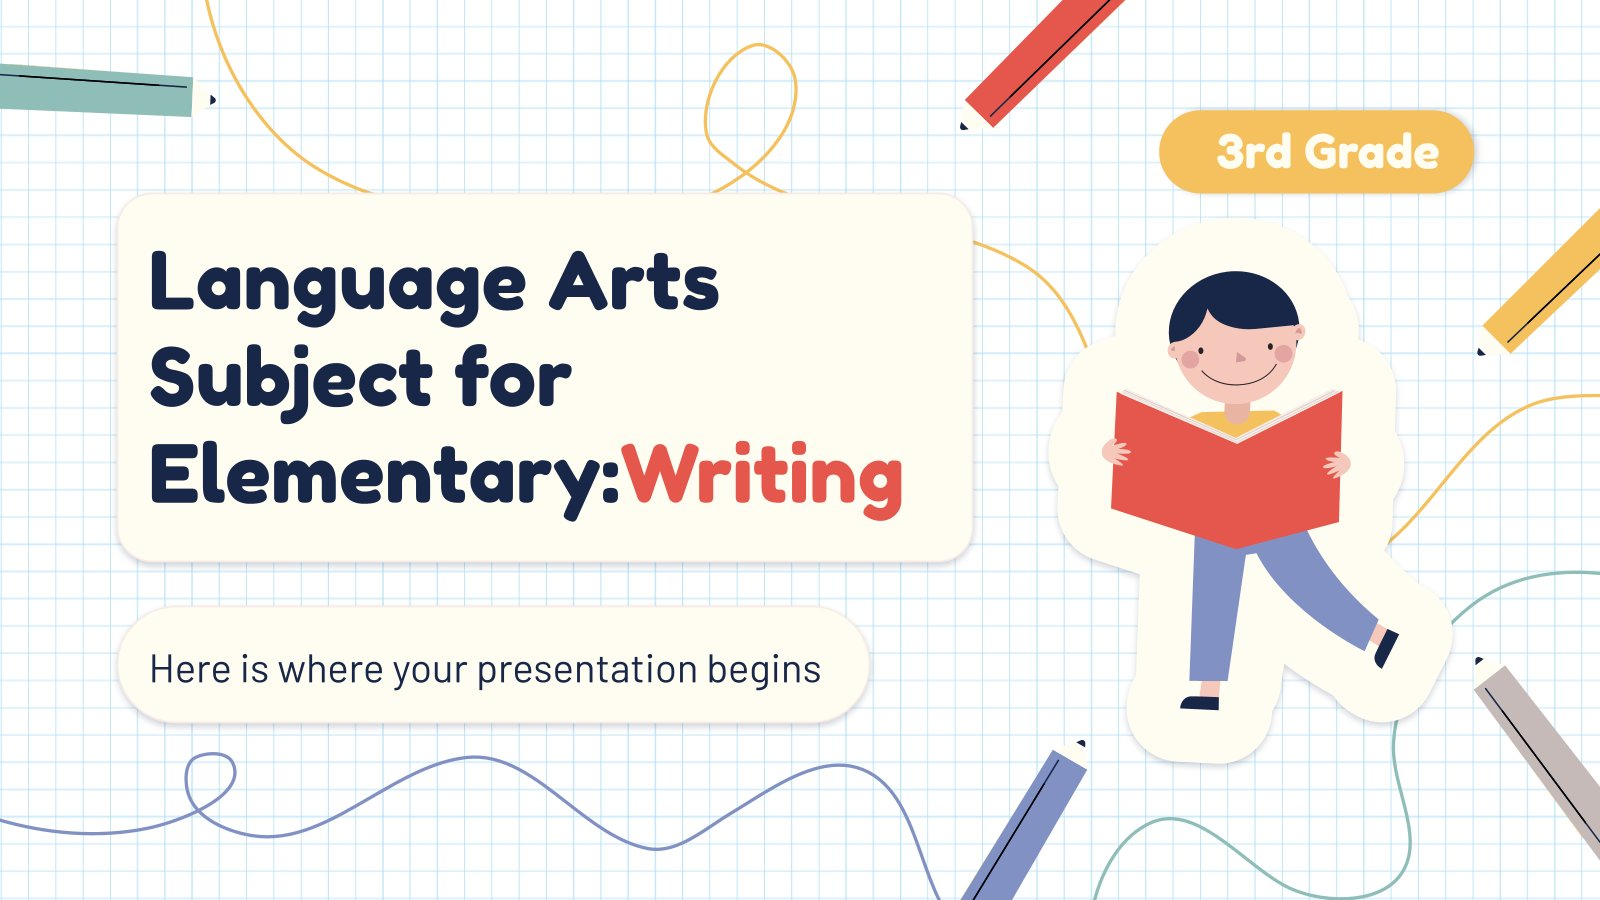 Plantilla de presentación Lengua para primaria: Escritura